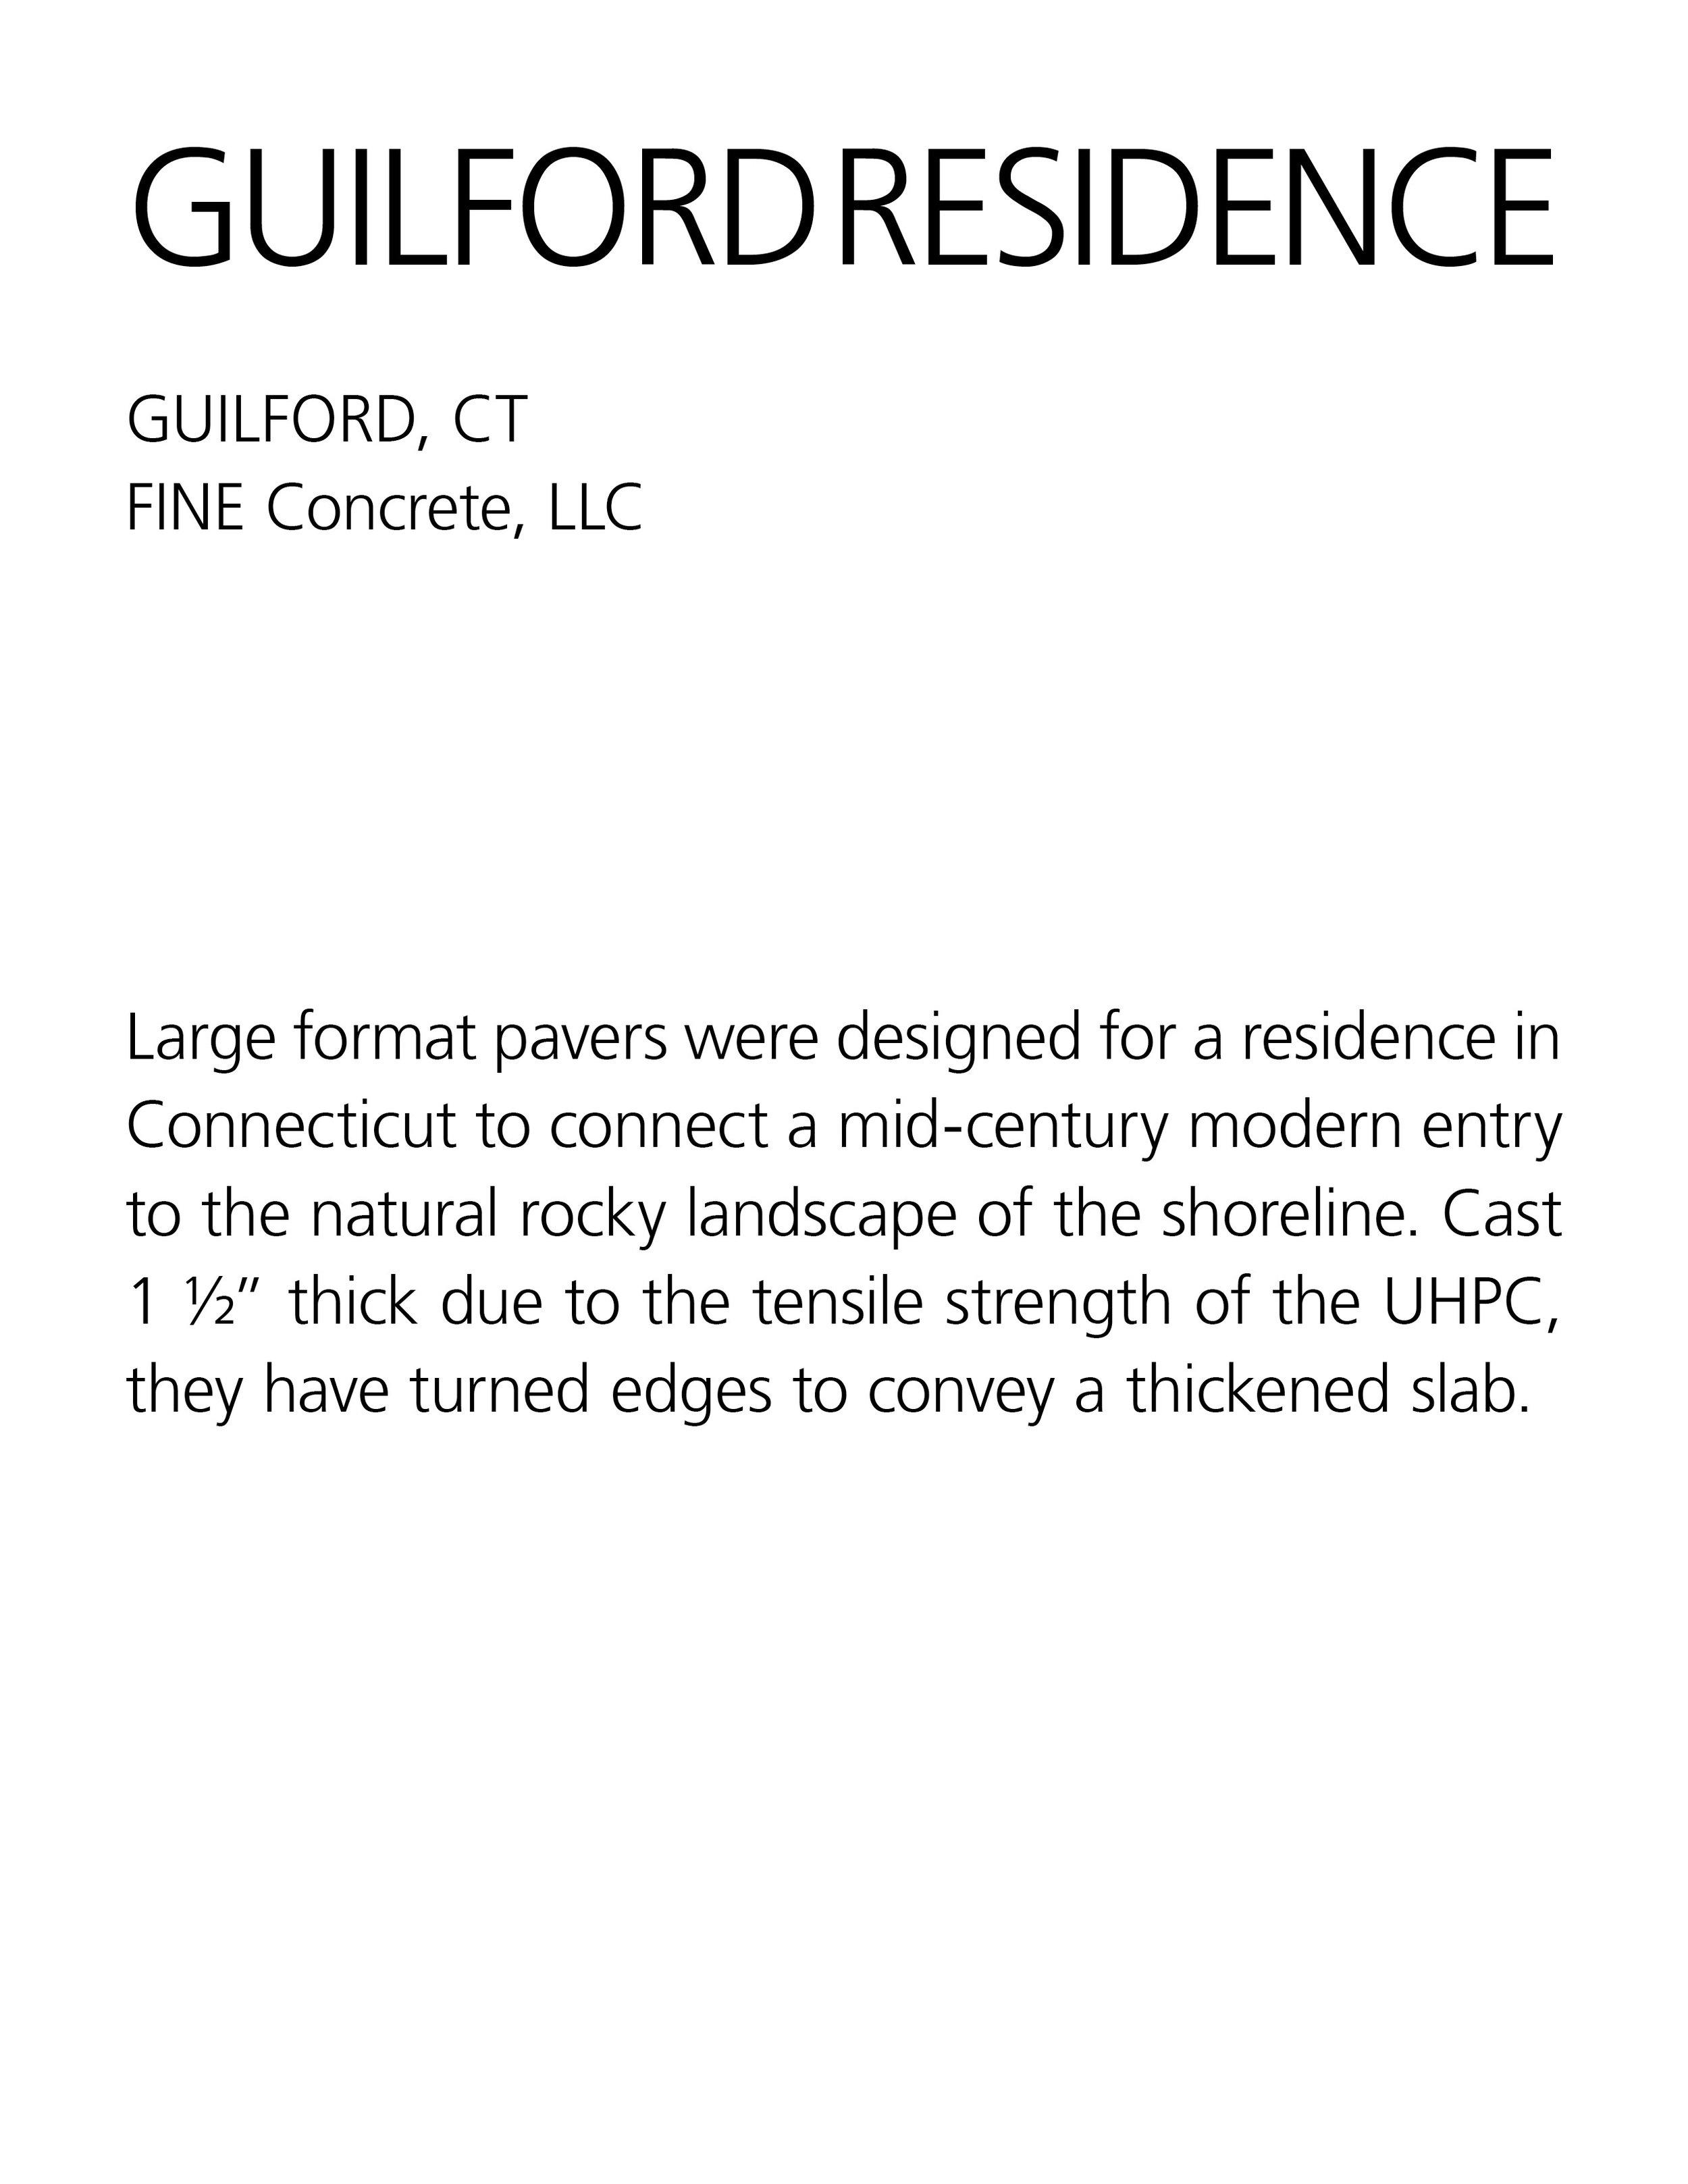 guilford description.jpg